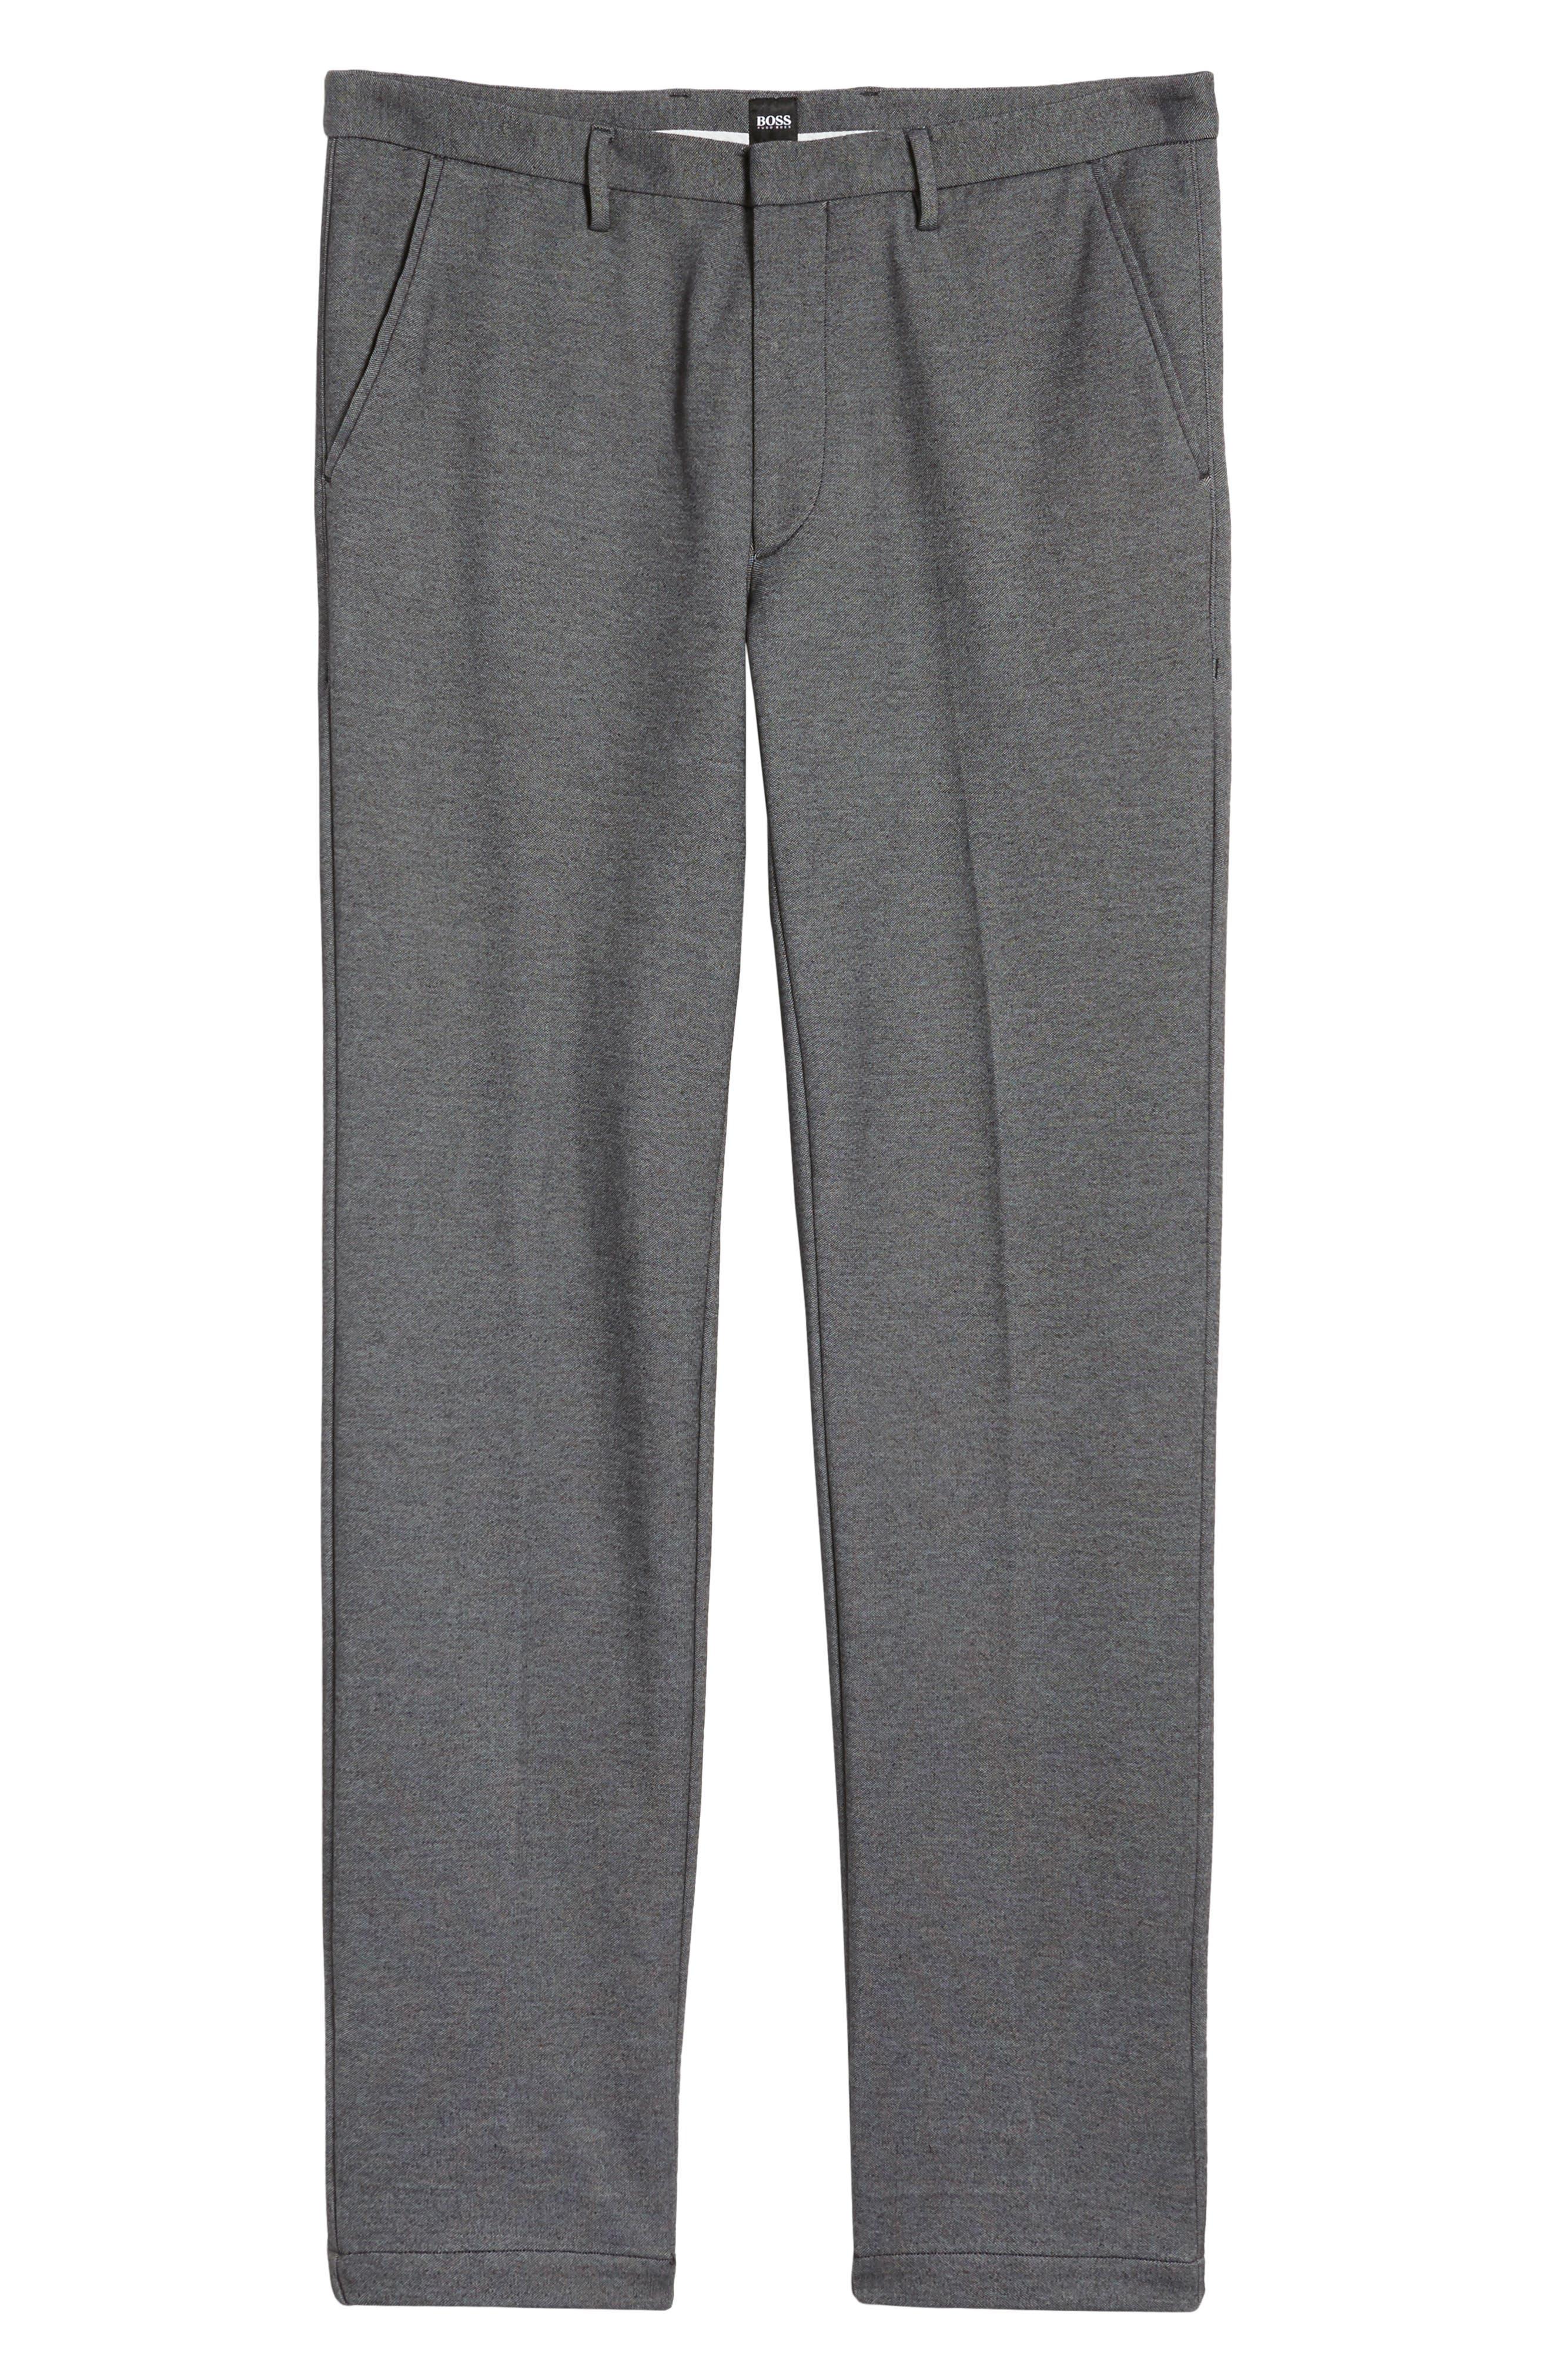 Kaito Melange Cotton Blend Pants,                             Alternate thumbnail 6, color,                             030